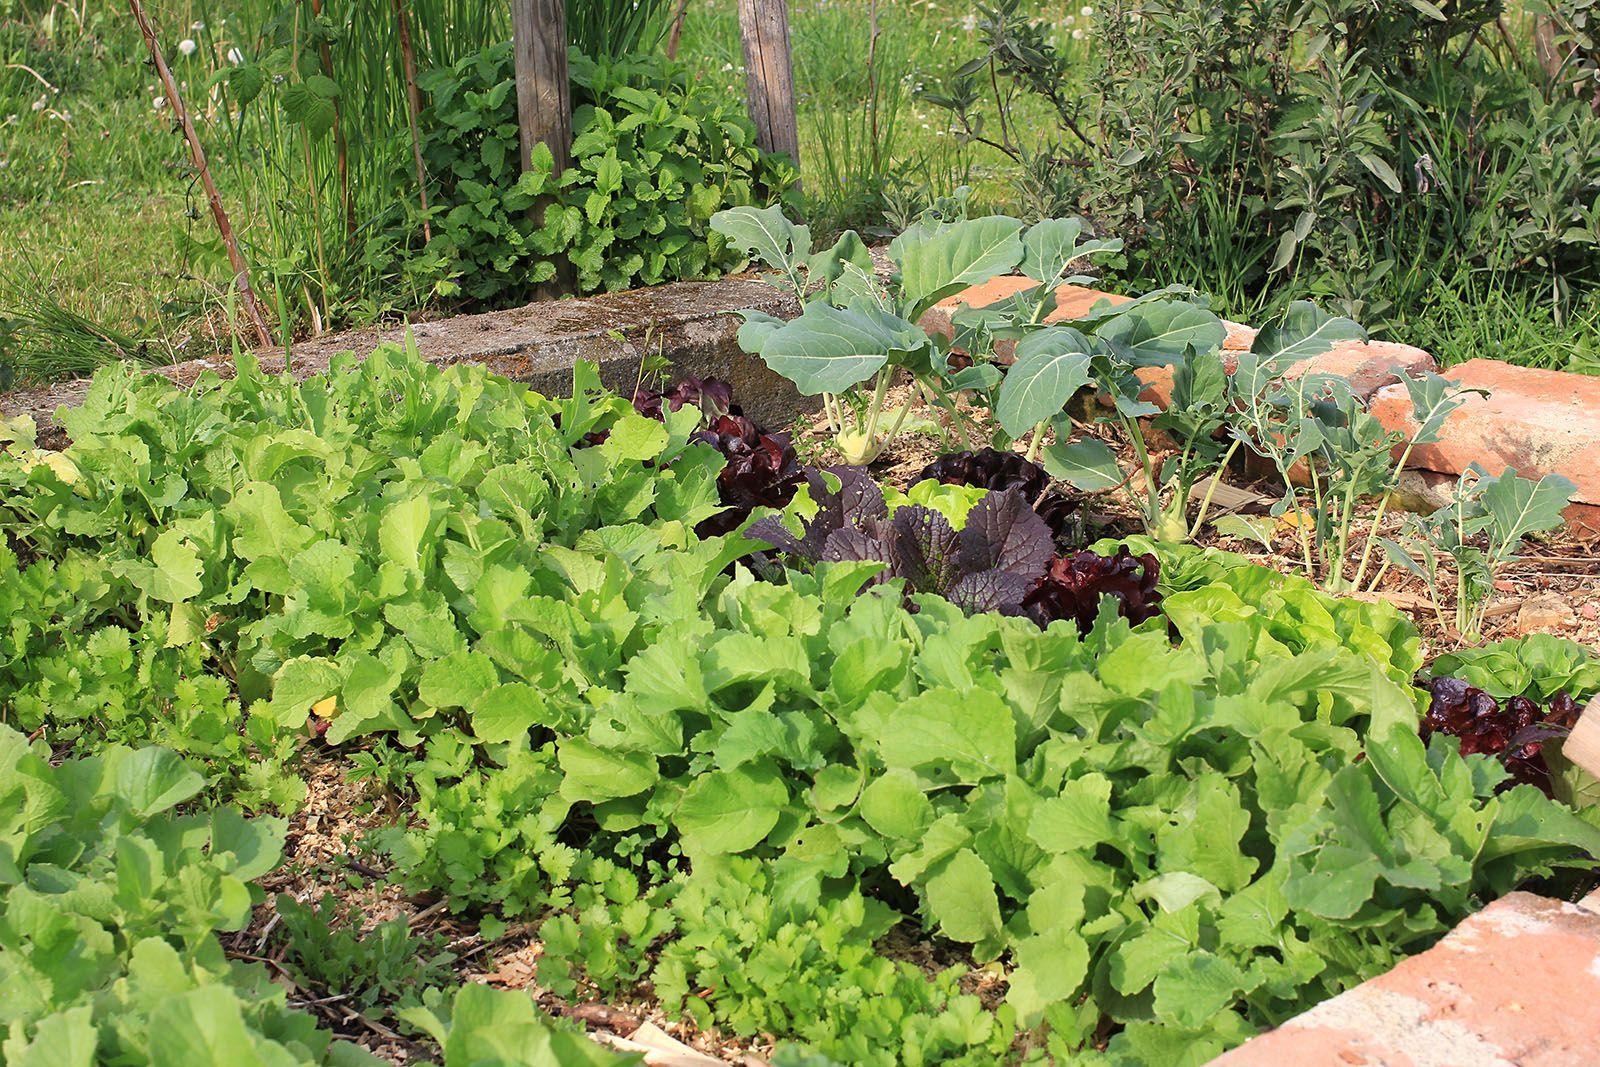 Salat-/Gemüsebeet mit Mulch aus Holzhackschnitzeln